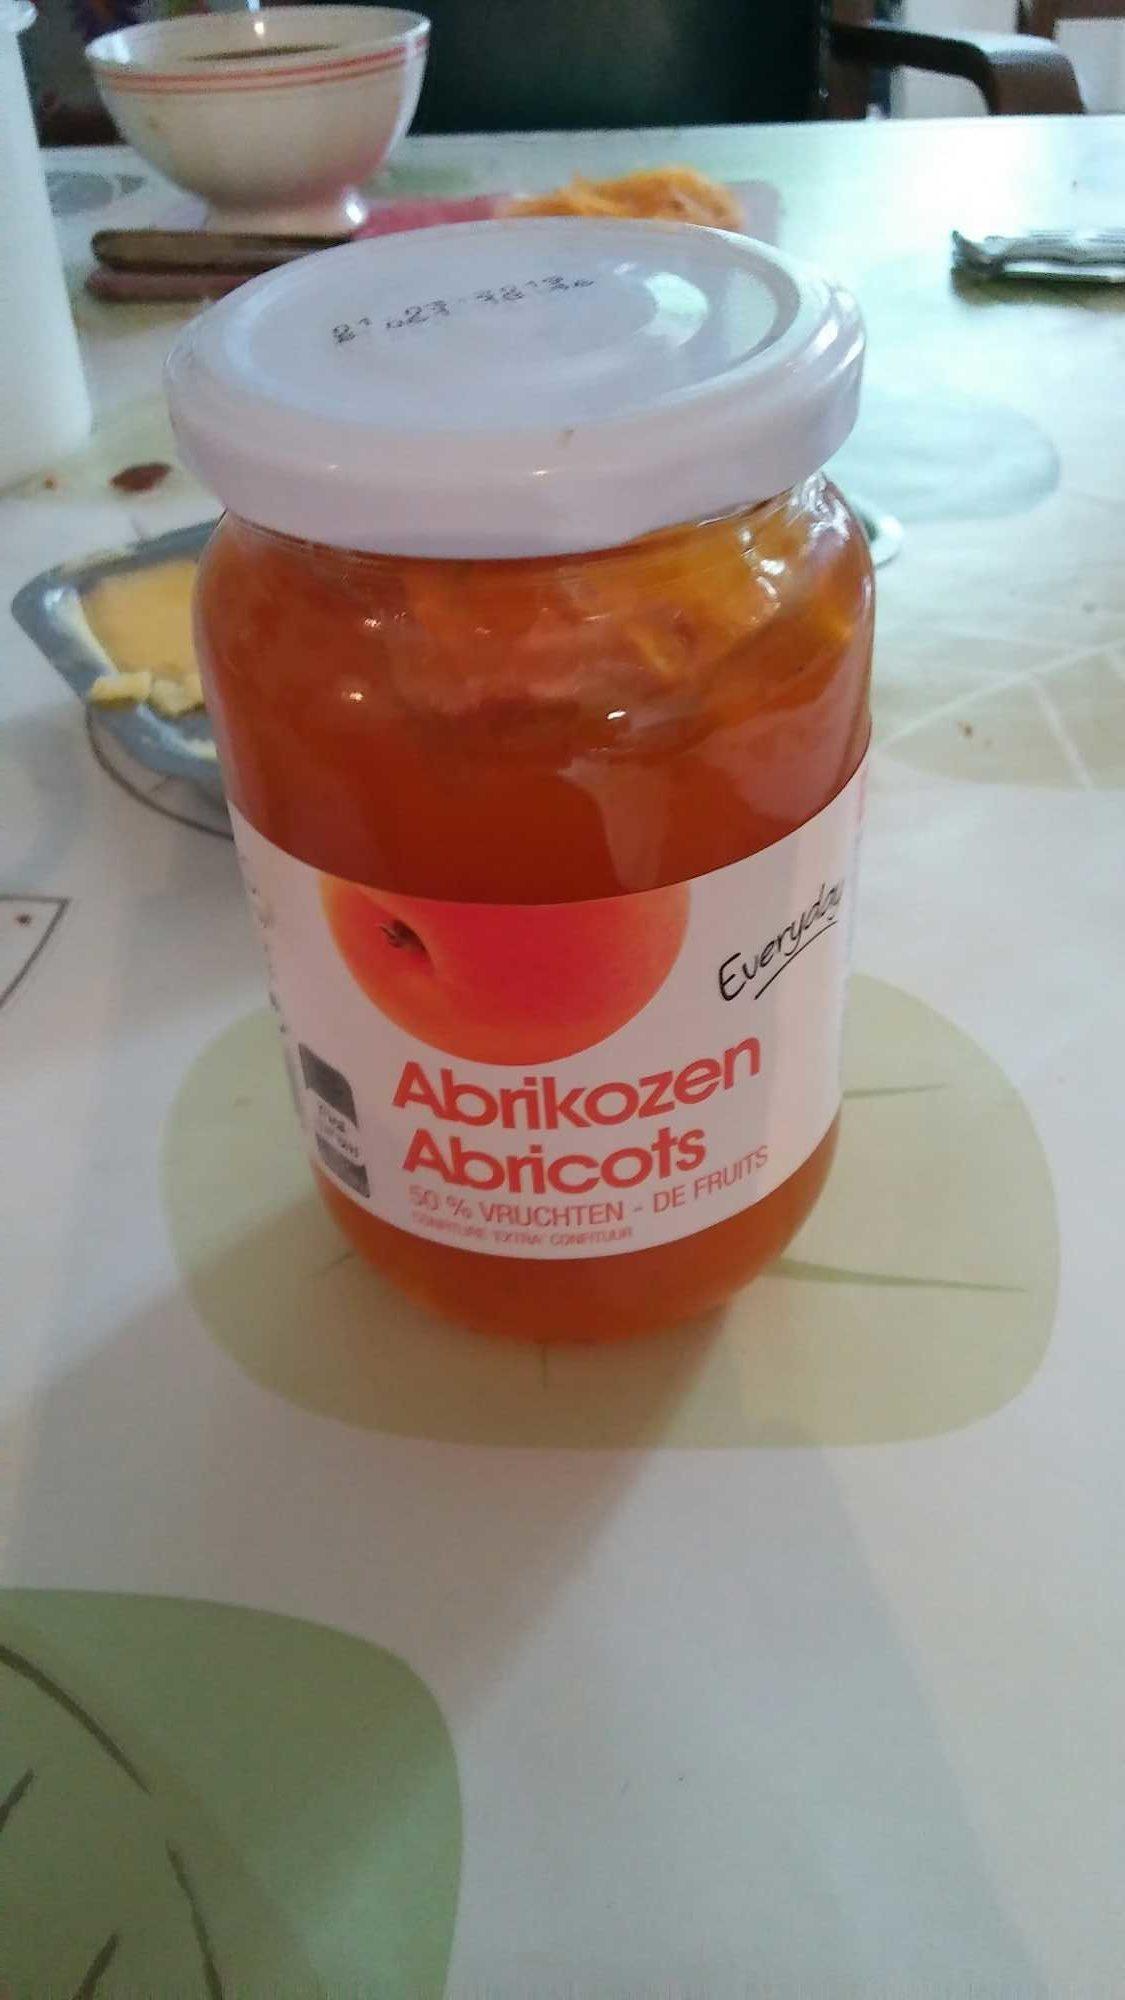 Abricots confiture - Product